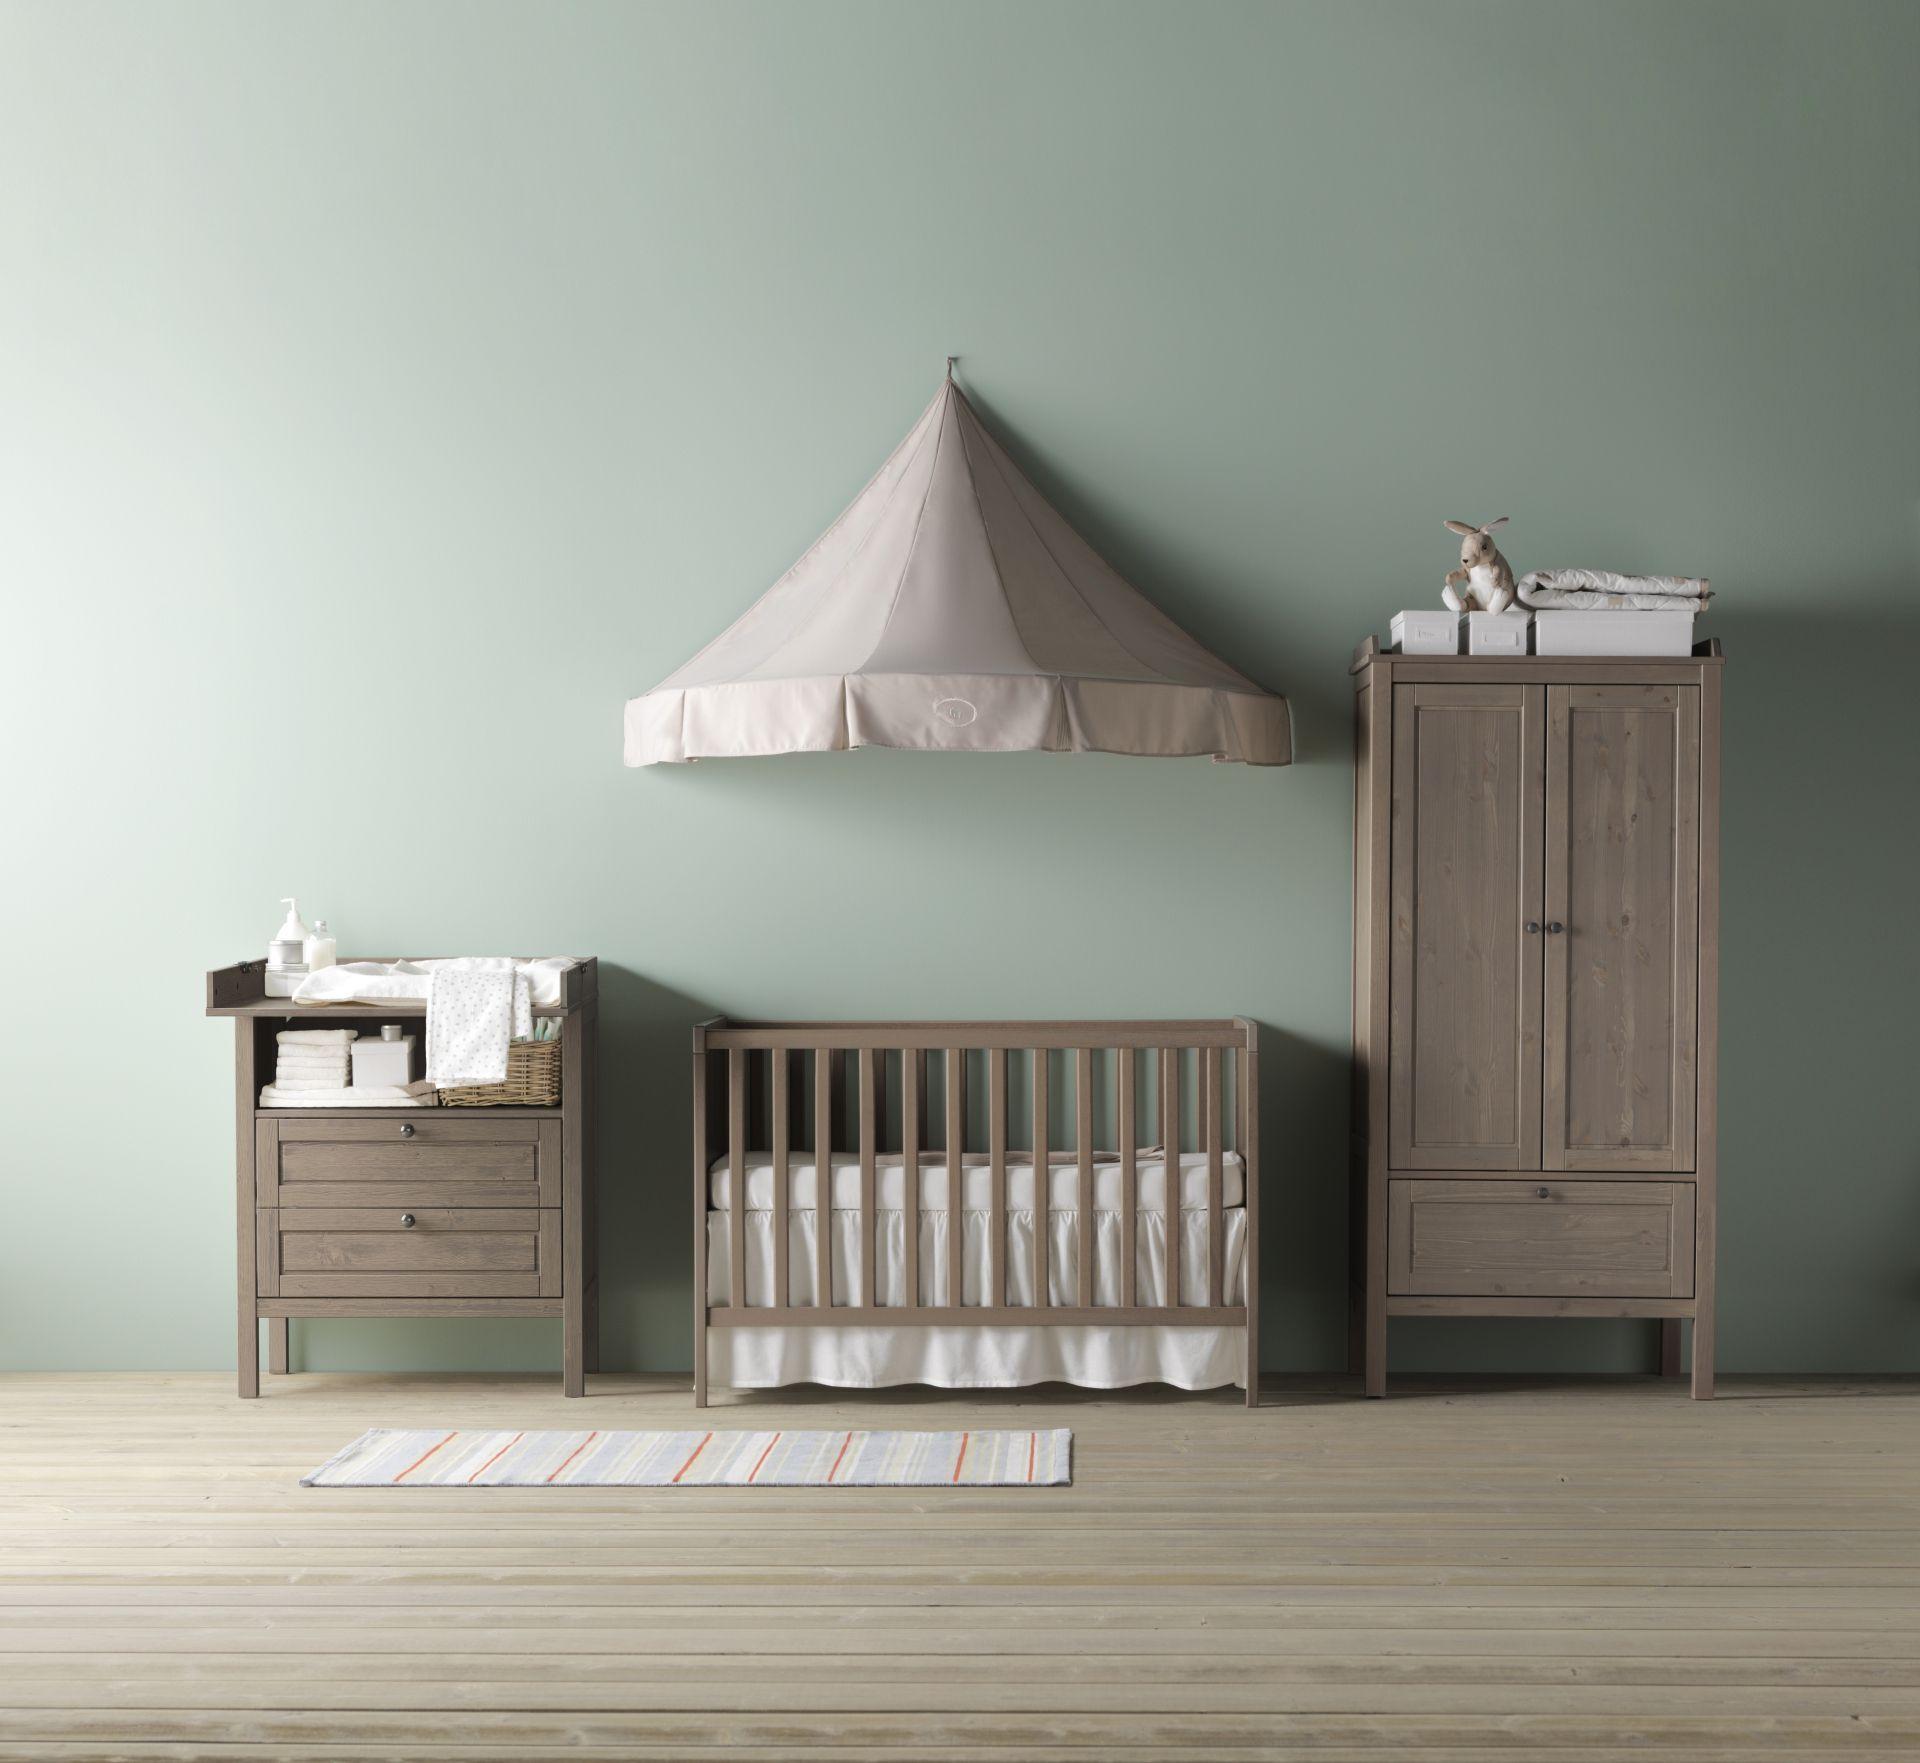 Sundvik babybedje commode ladekast en garderobekast ikeacatalogus nieuw interior Master bedroom plus nursery